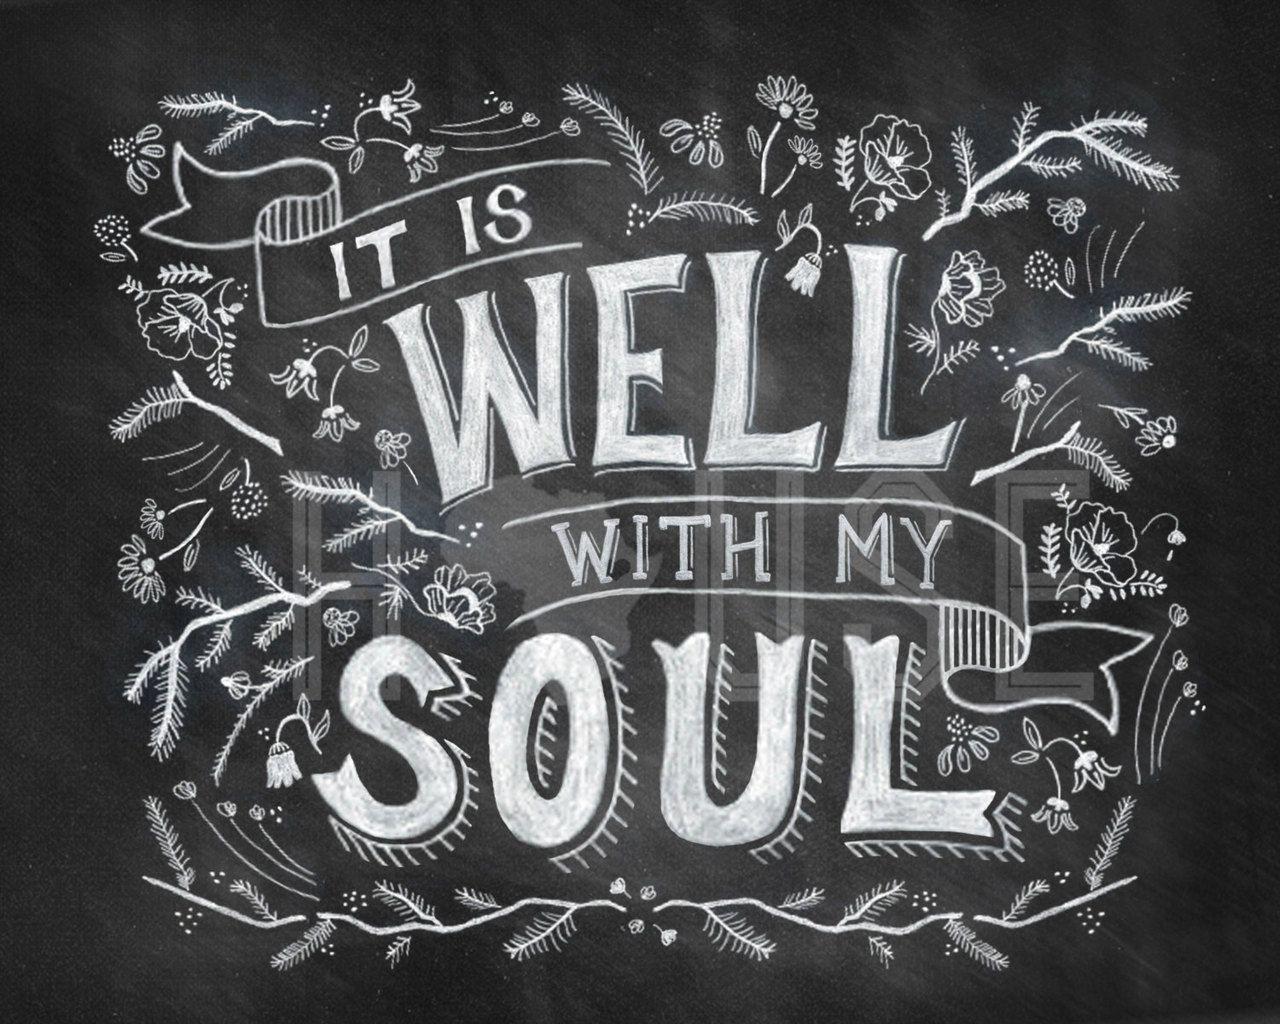 It is Well With My Soul 8x10 Chalkboard Print